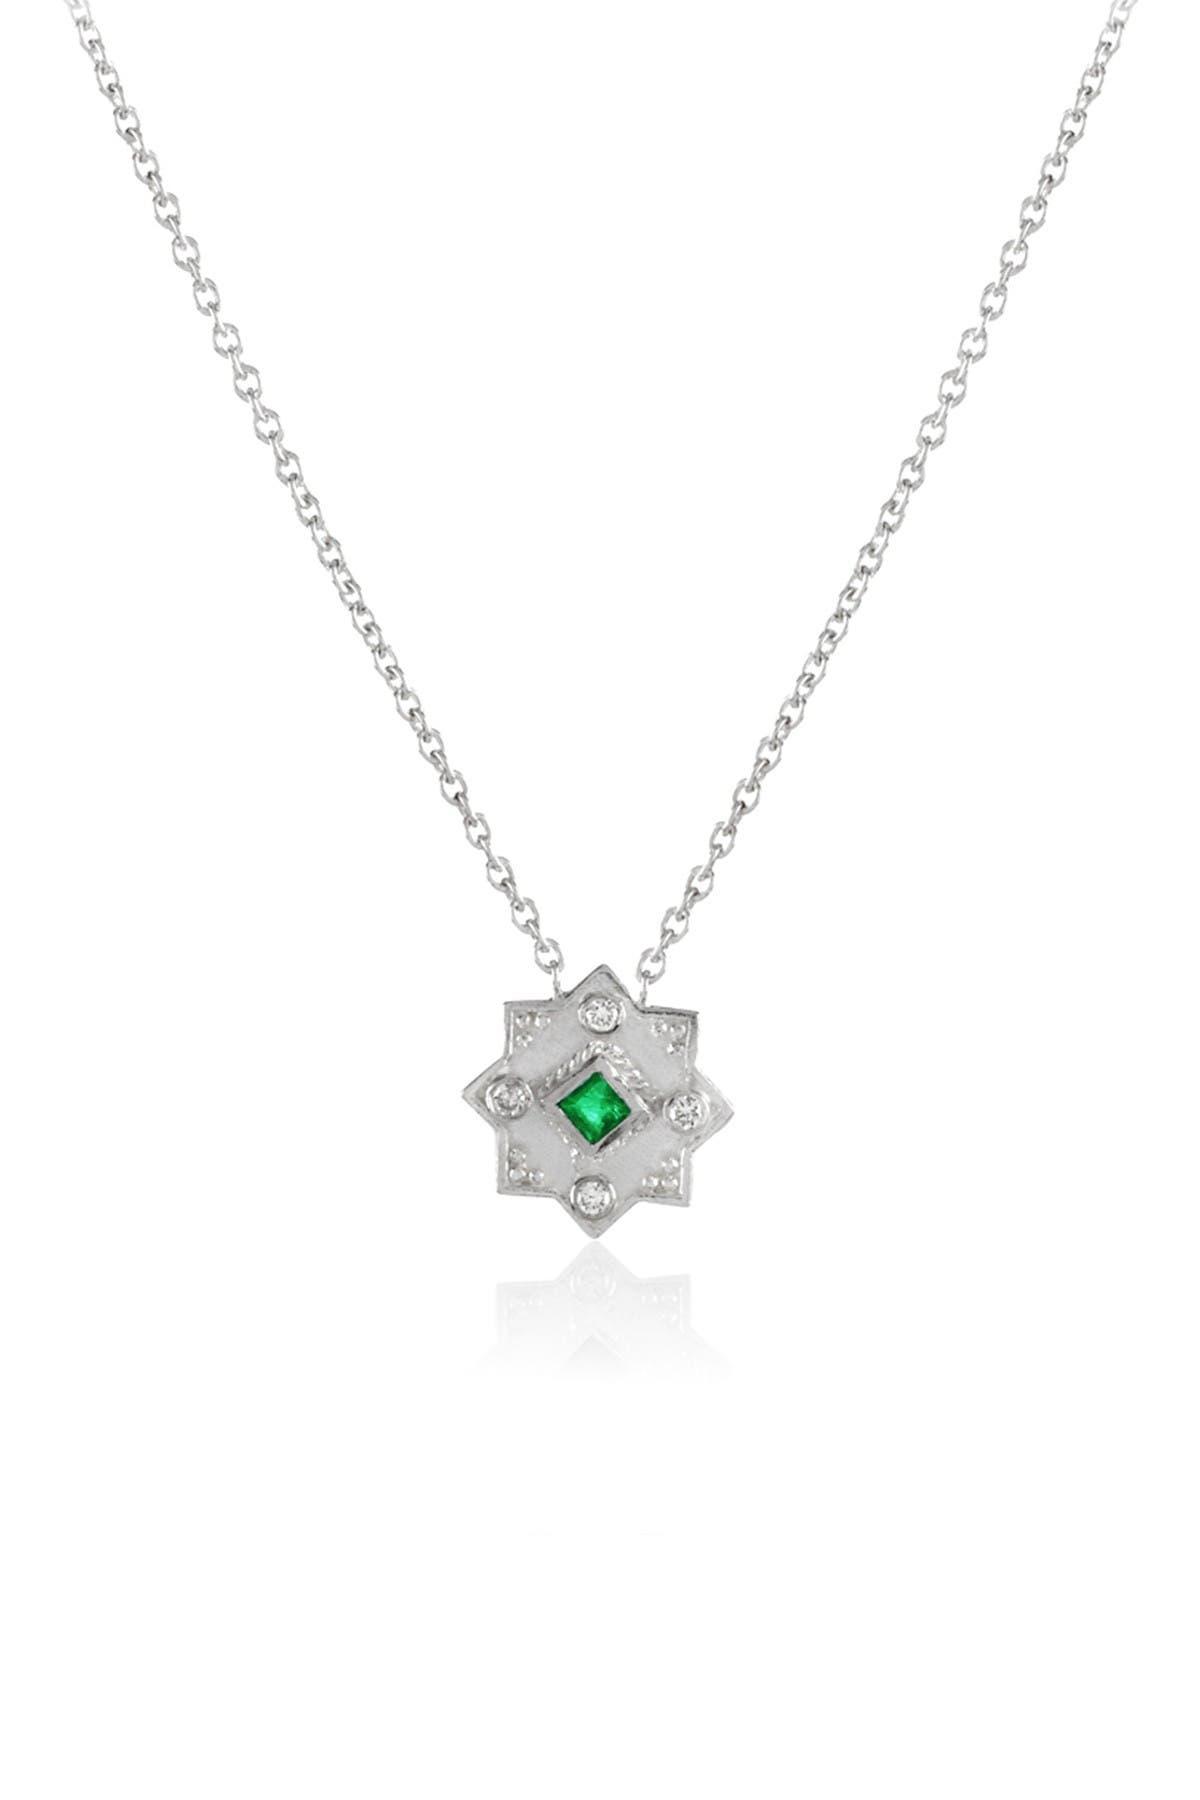 Image of LEGEND AMRAPALI SILVER Sterling Silver Heritage Star of Lakshmi Emerald & Diamond Pendant Necklace